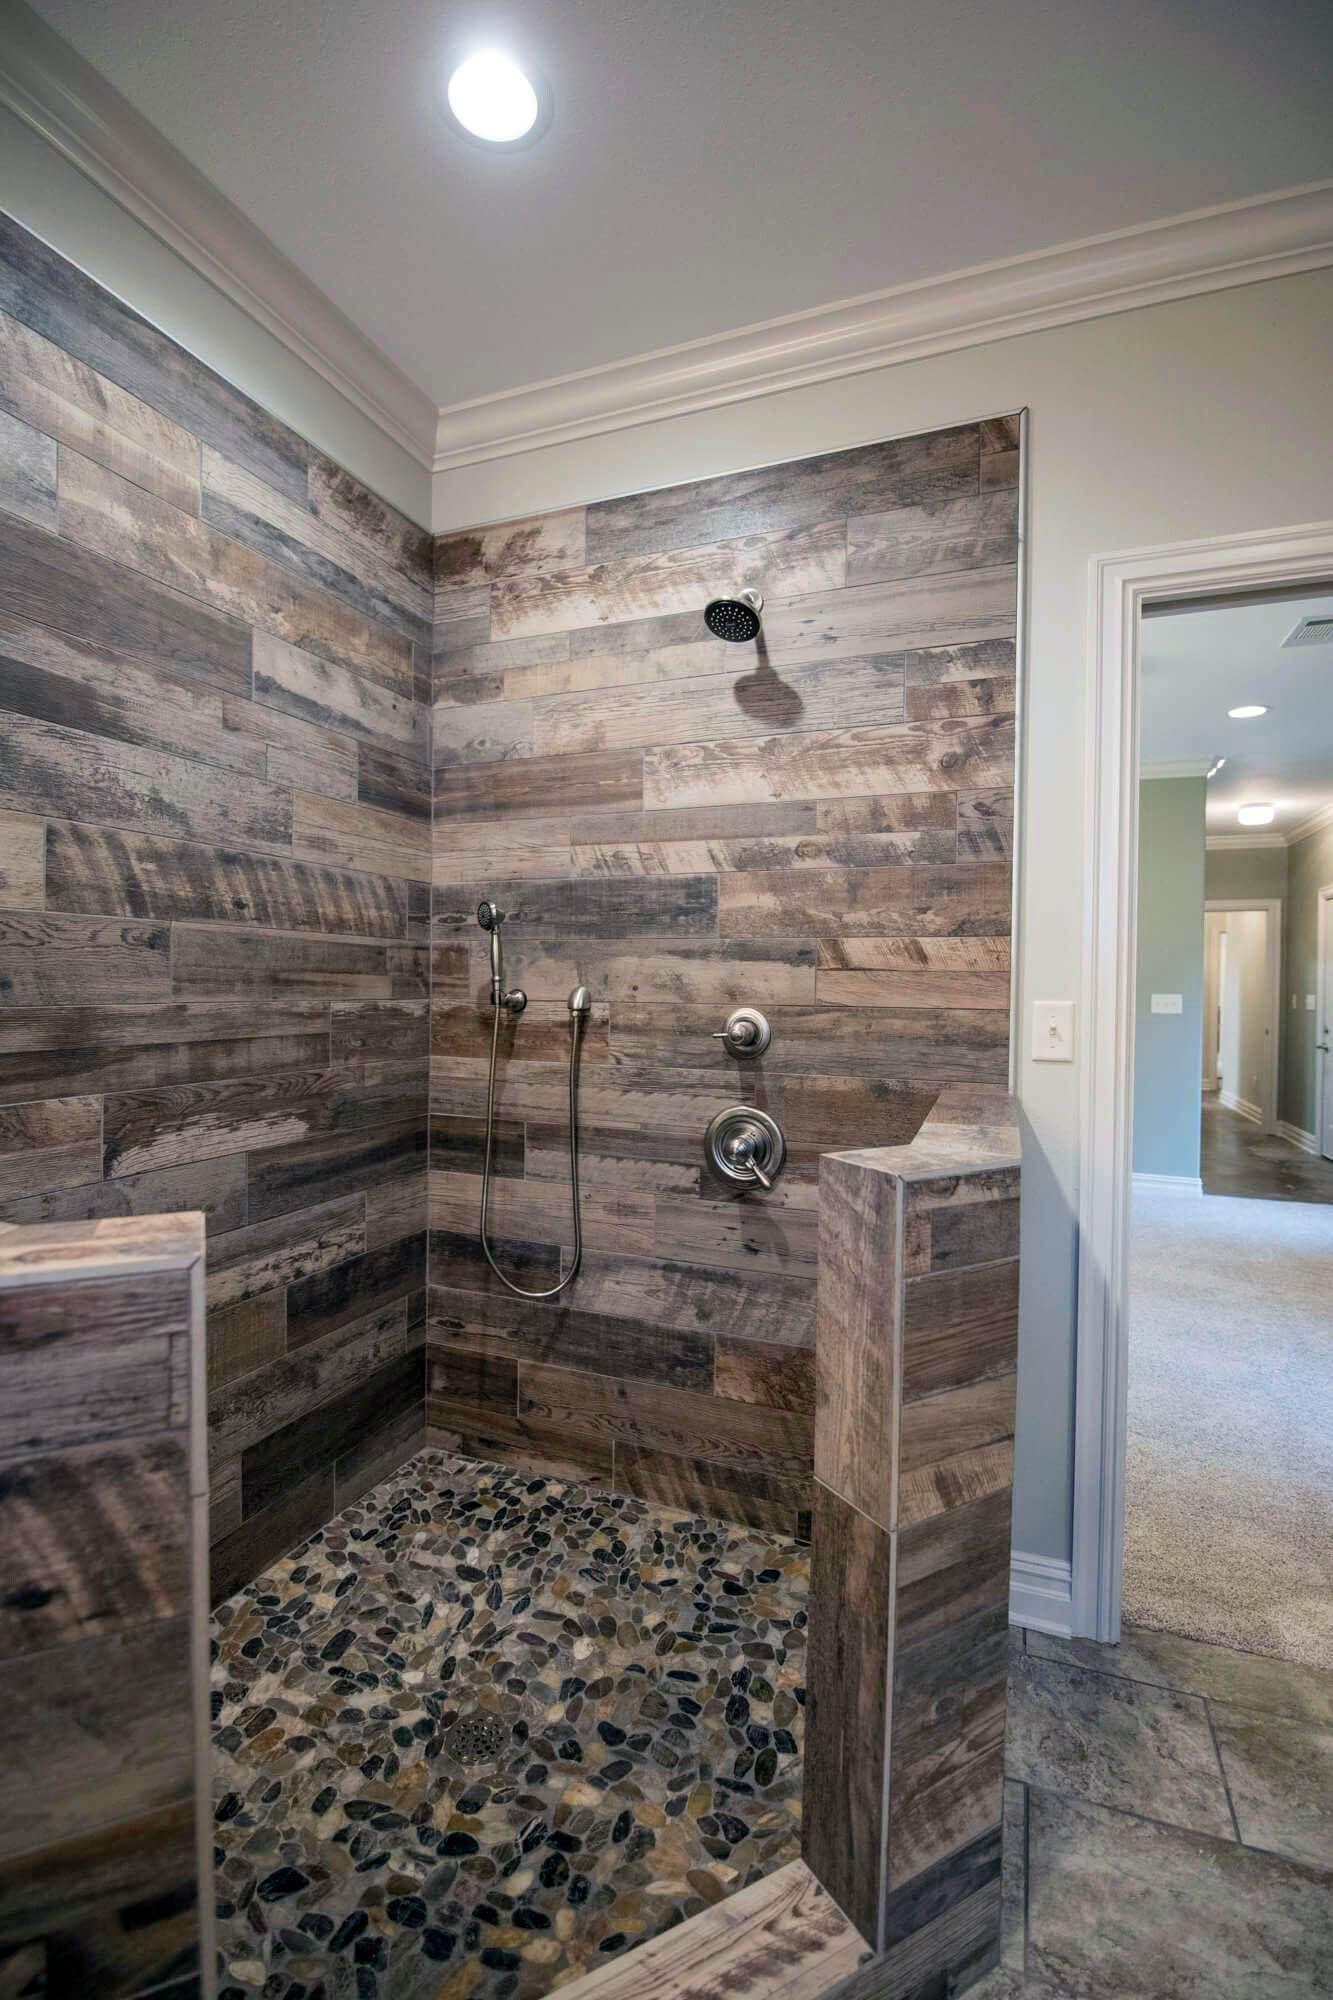 10 Of Our Favorite Shower Tile Ideas Bathroom Remodel Shower Rustic Bathrooms Bathroom Shower Tile